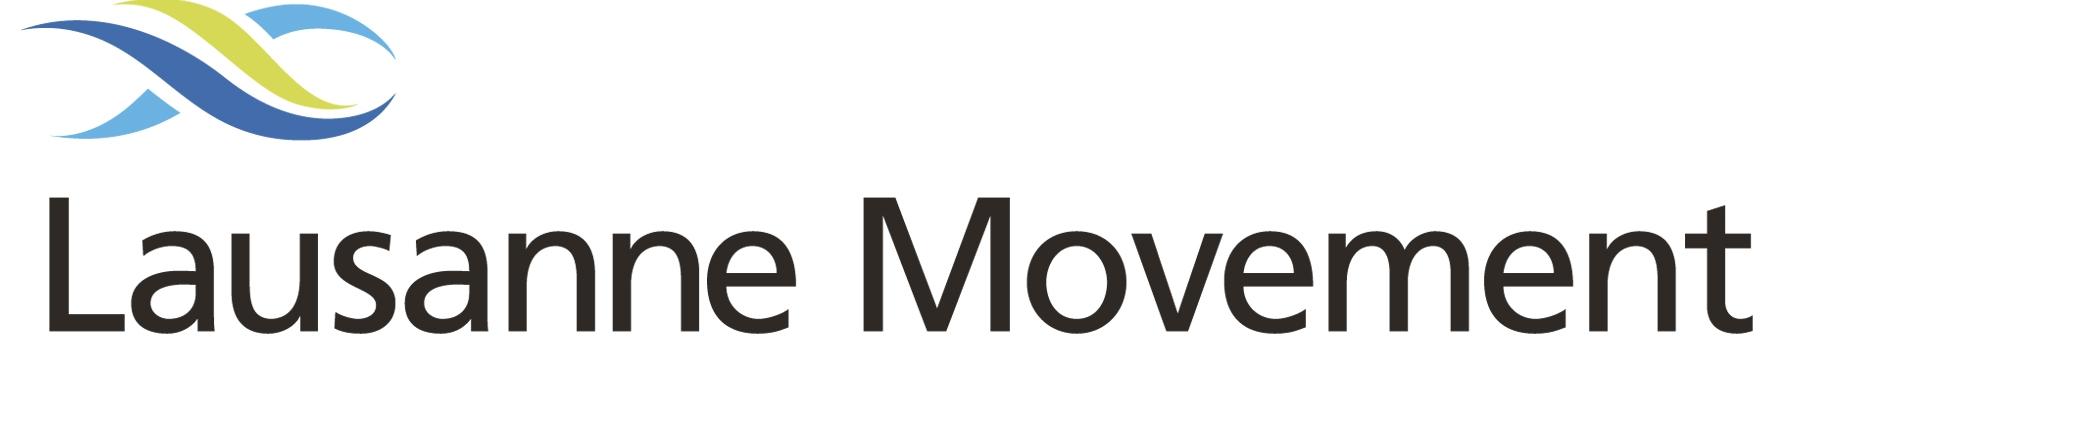 Lausanne Movement Logo with Tagline (English - Large).jpg